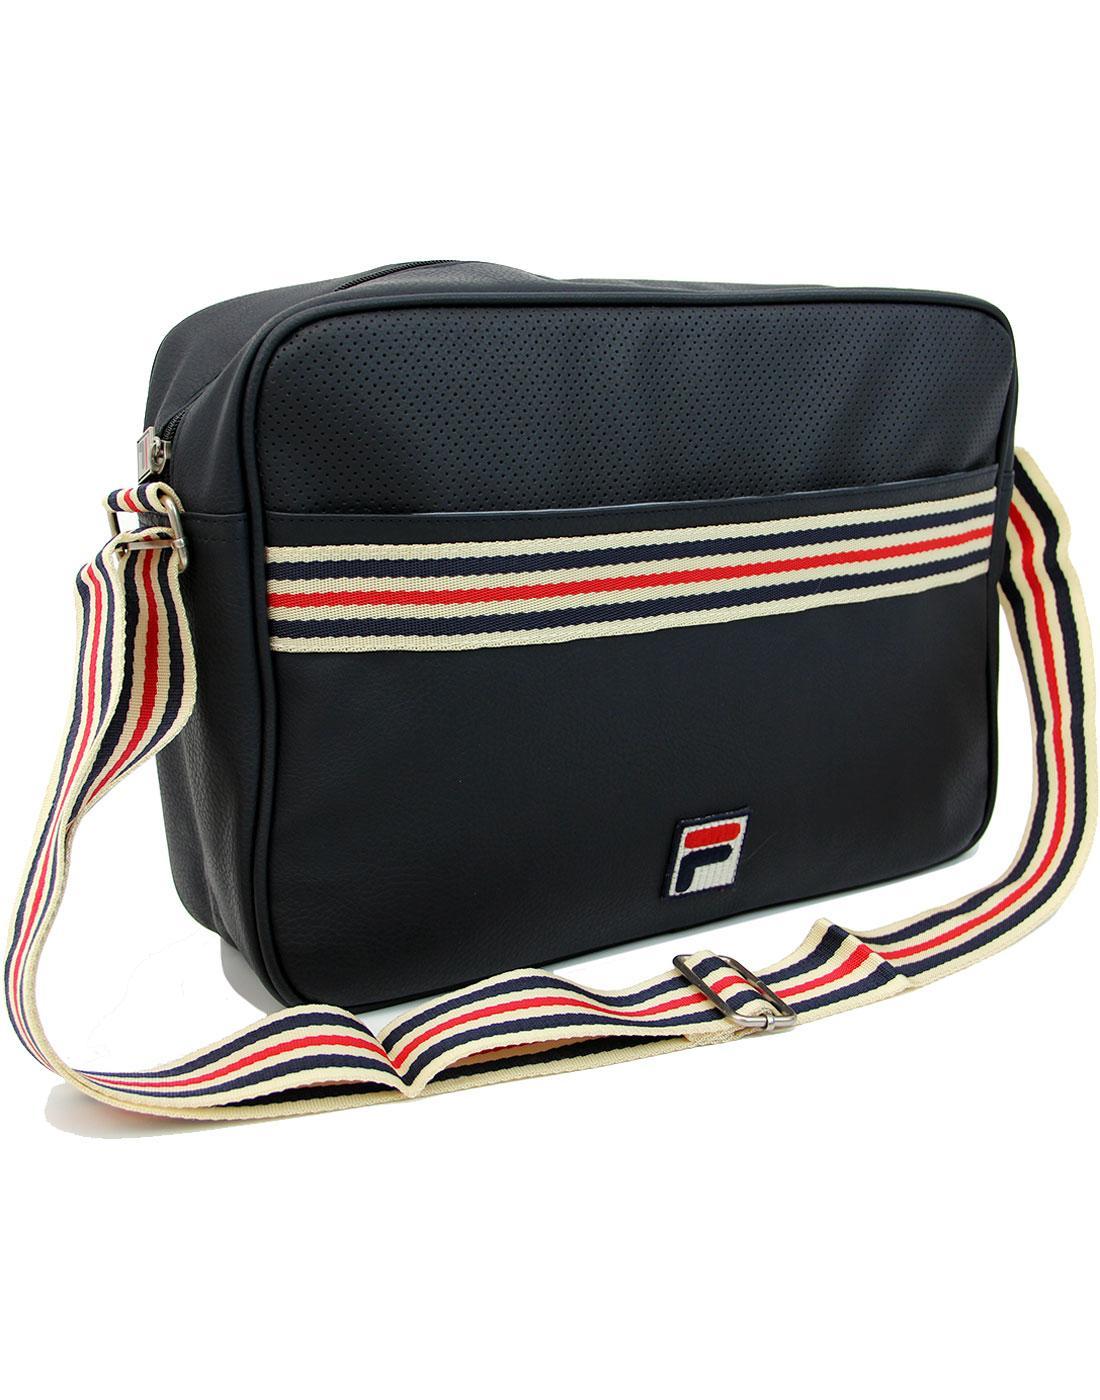 2c2e6b2ed2 Mercia FILA VINTAGE Retro Seventies Shoulder Bag in Peacoat